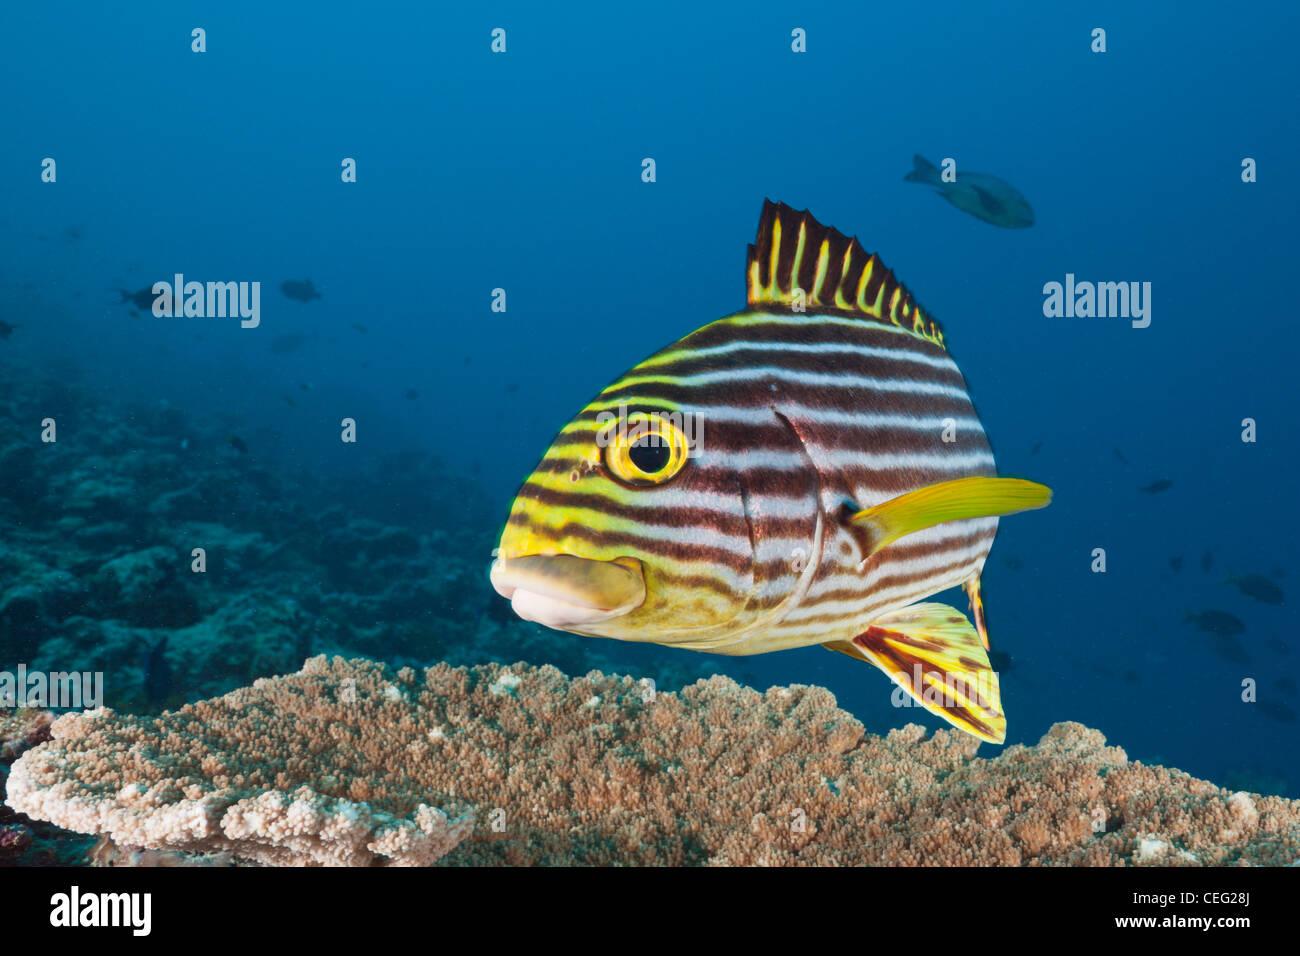 Oriental Sweetlips, Plectorhinchus vittatus, North Male Atoll, Indian Ocean, Maldives - Stock Image